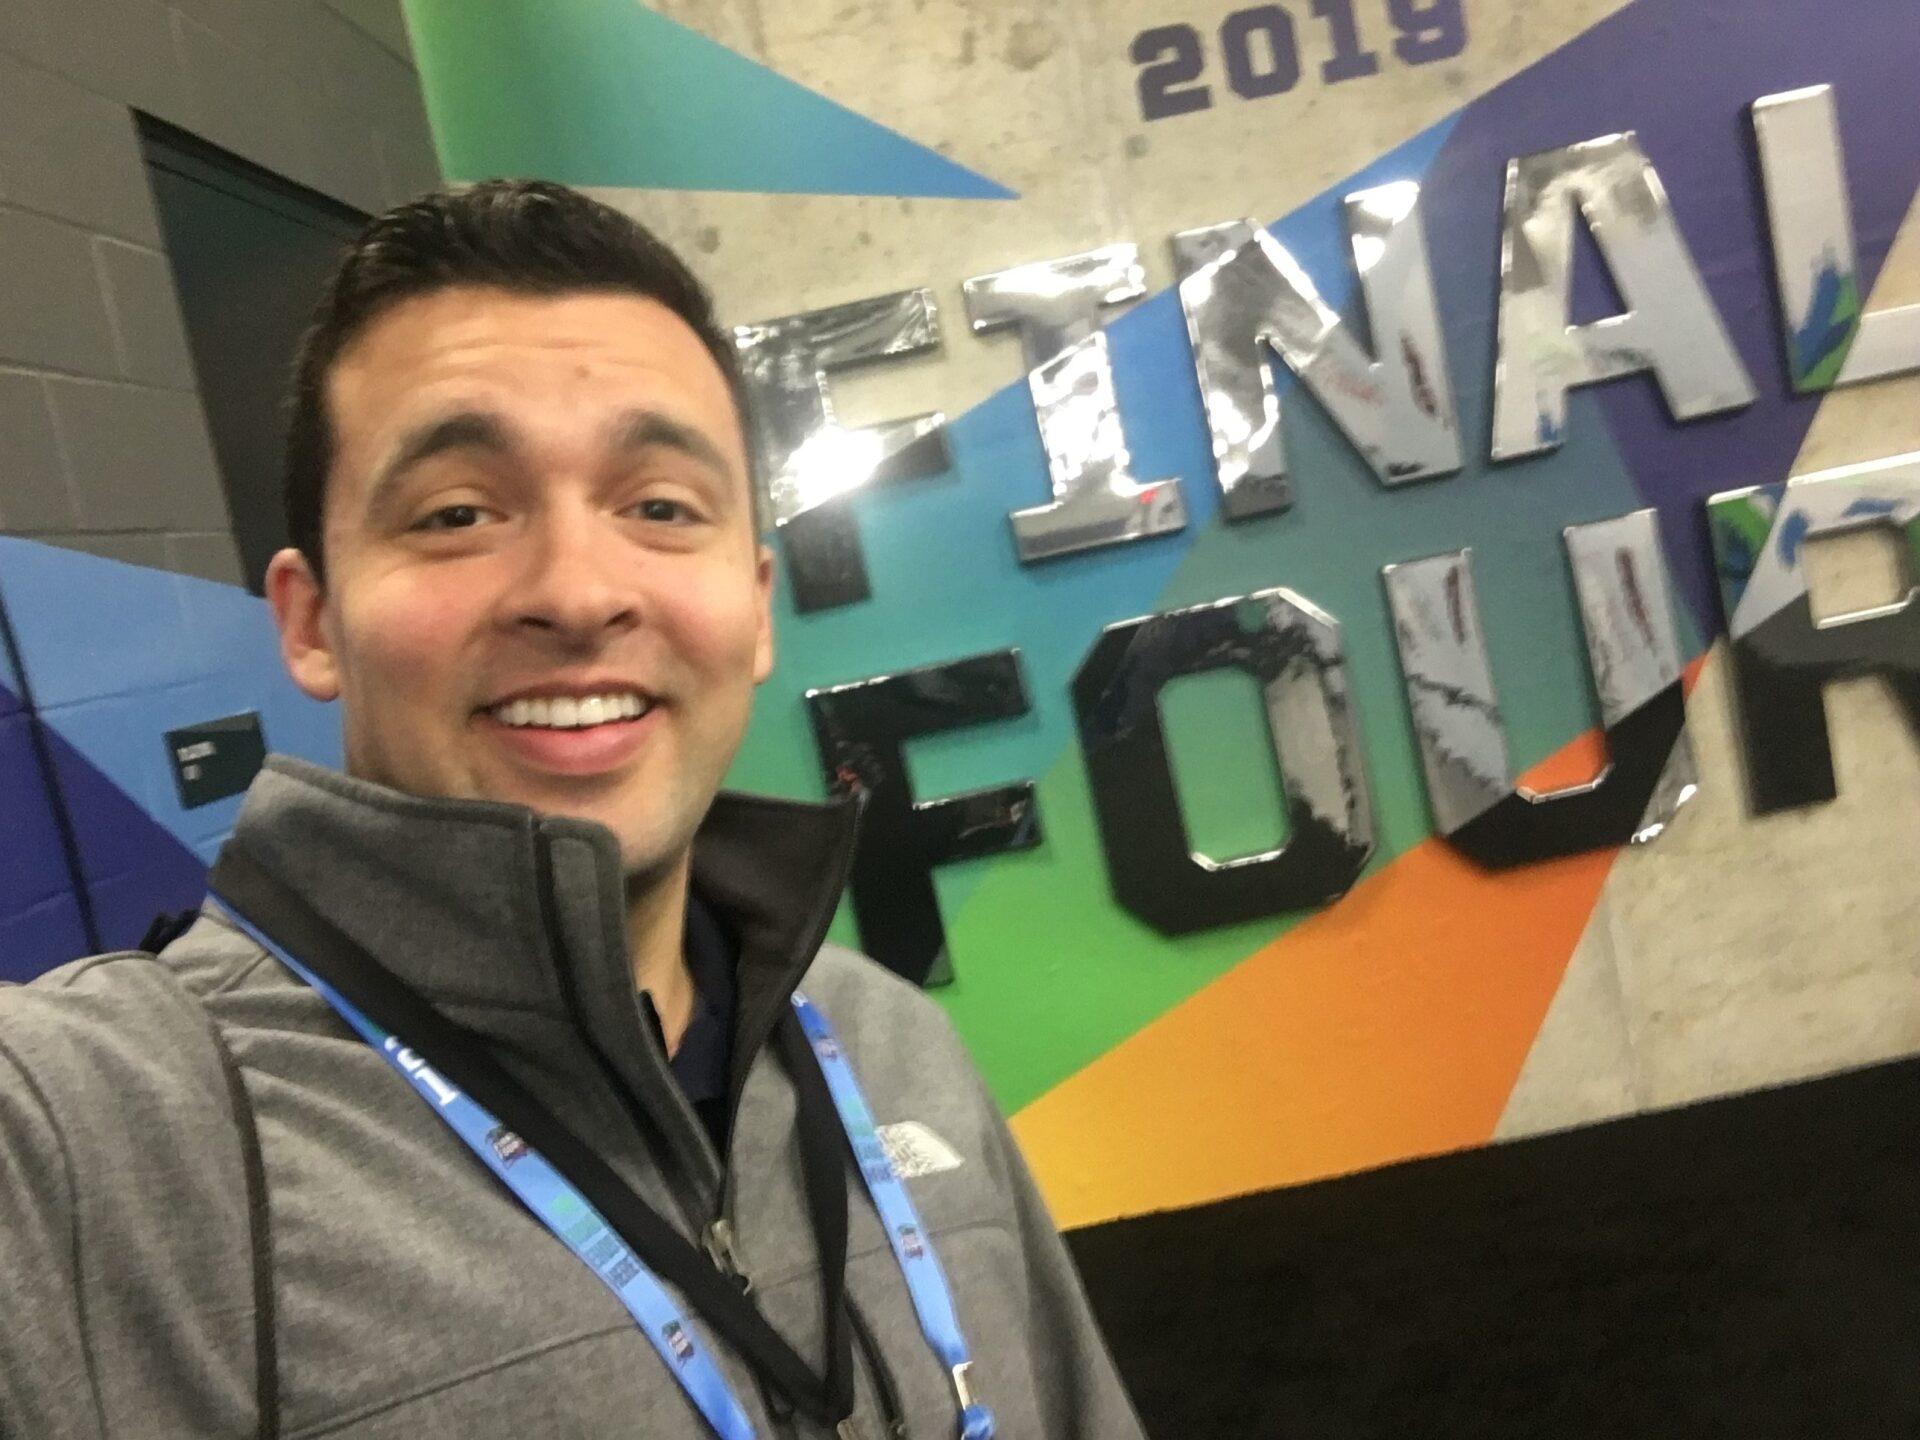 Photos: News 3 explores Minneapolis ahead of FinalFour